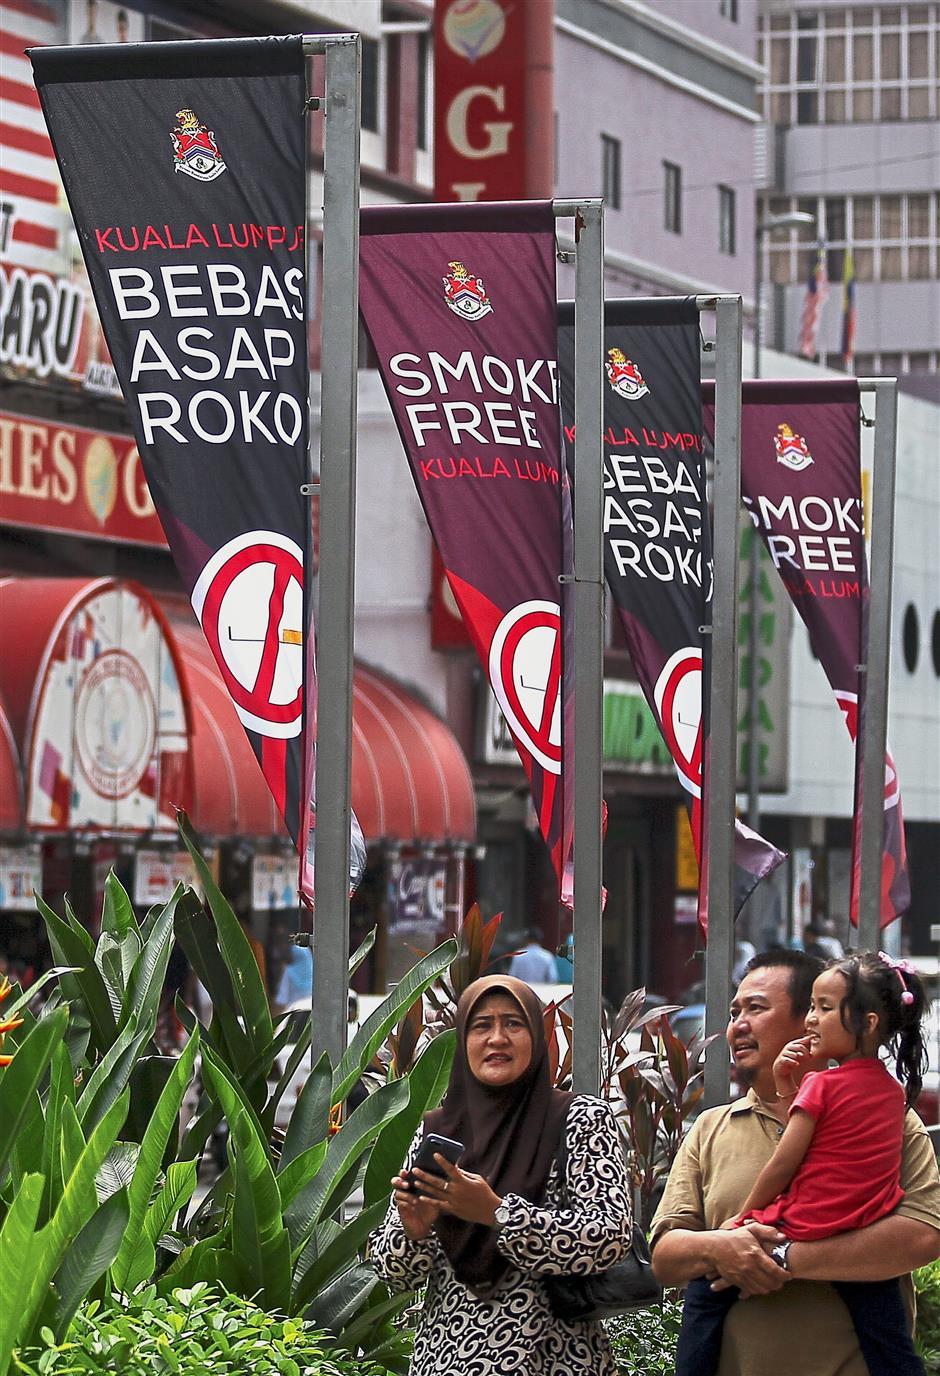 Raising awareness: People walking pass 'Smoke-free Kuala Lumpur' banners along a walkway in Kuala Lumpur. — Bernama